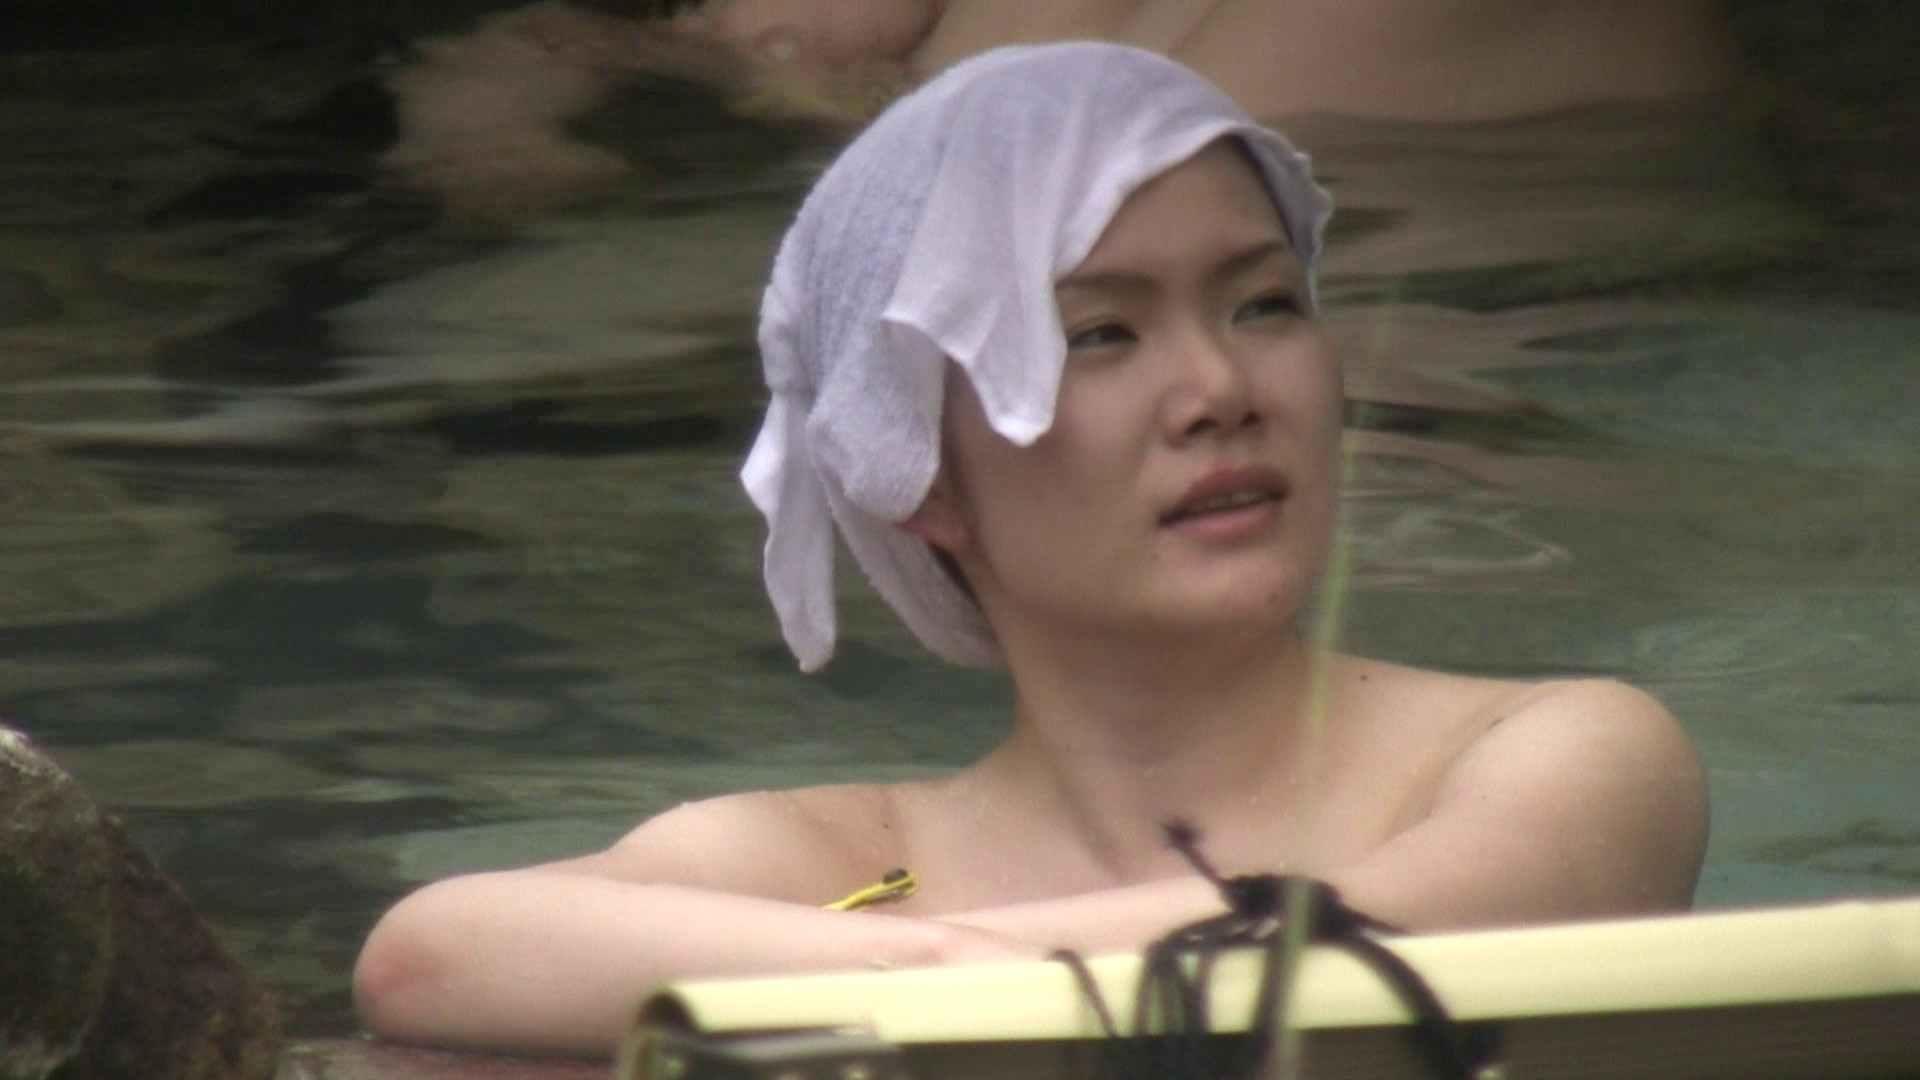 Aquaな露天風呂Vol.12【VIP】 露天風呂突入 | 美しいOLの裸体  78pic 25